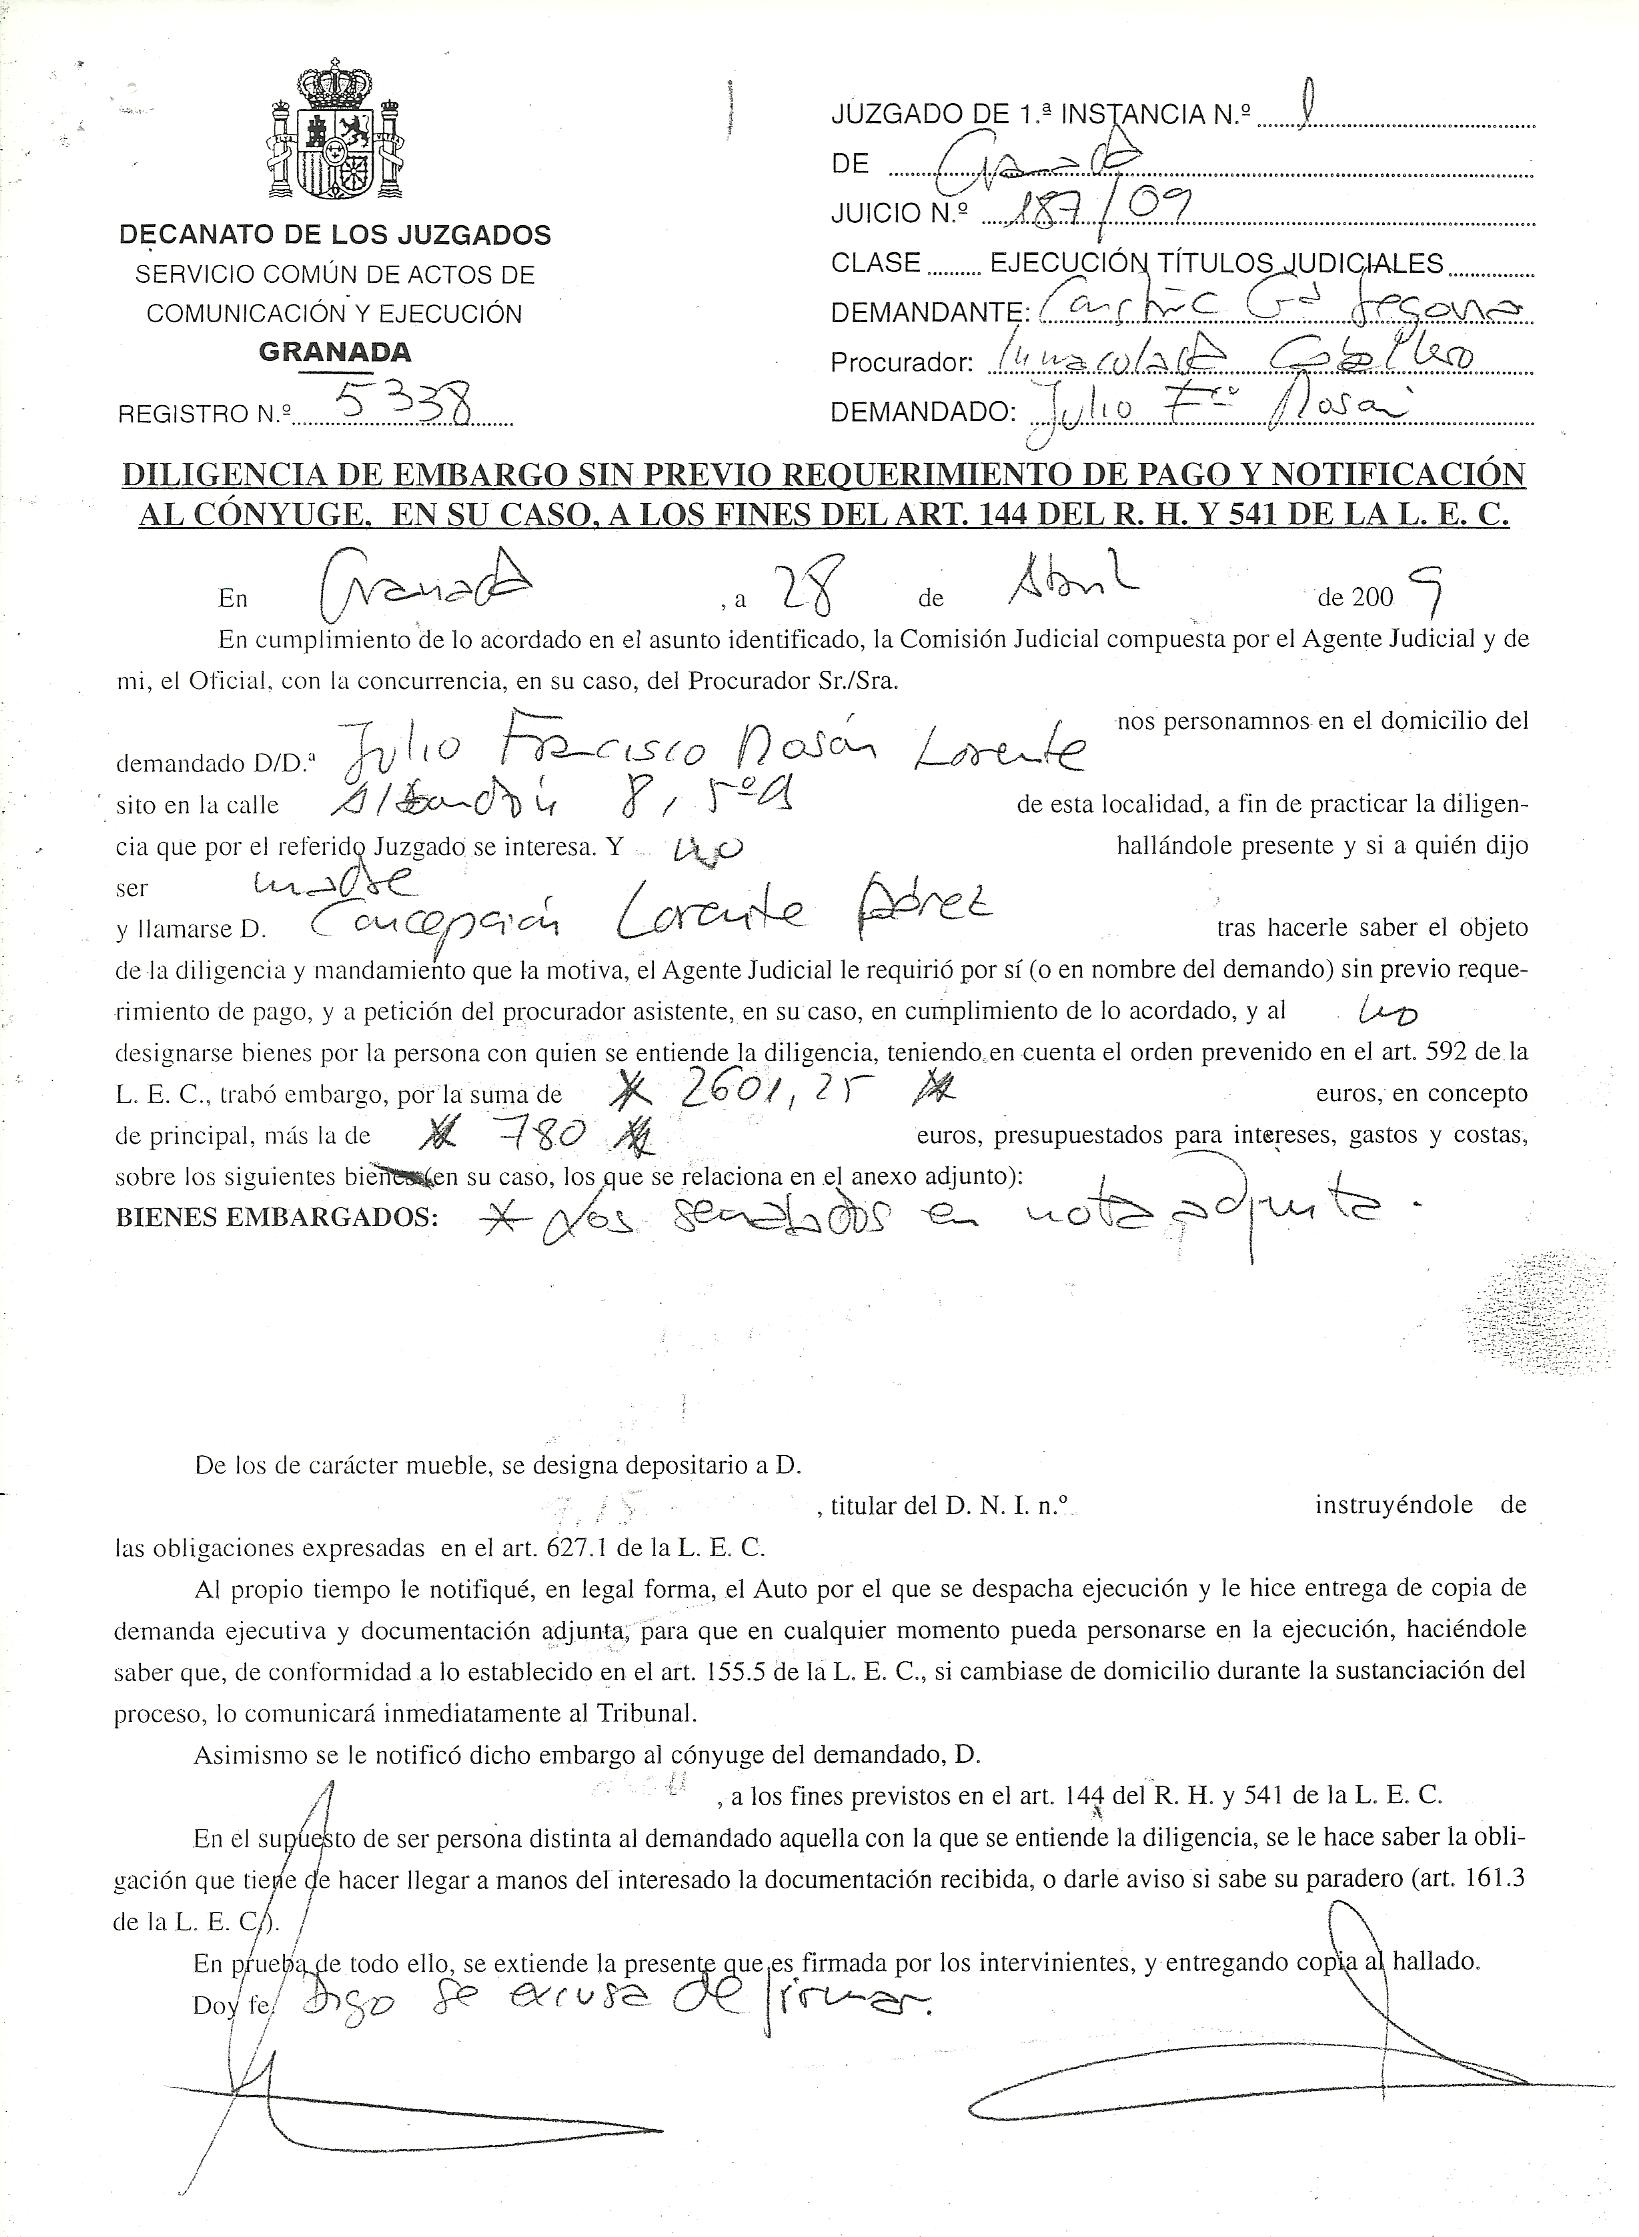 STOP INMOBILIARIAS  Richard Vilert Beltrn el advenedizo